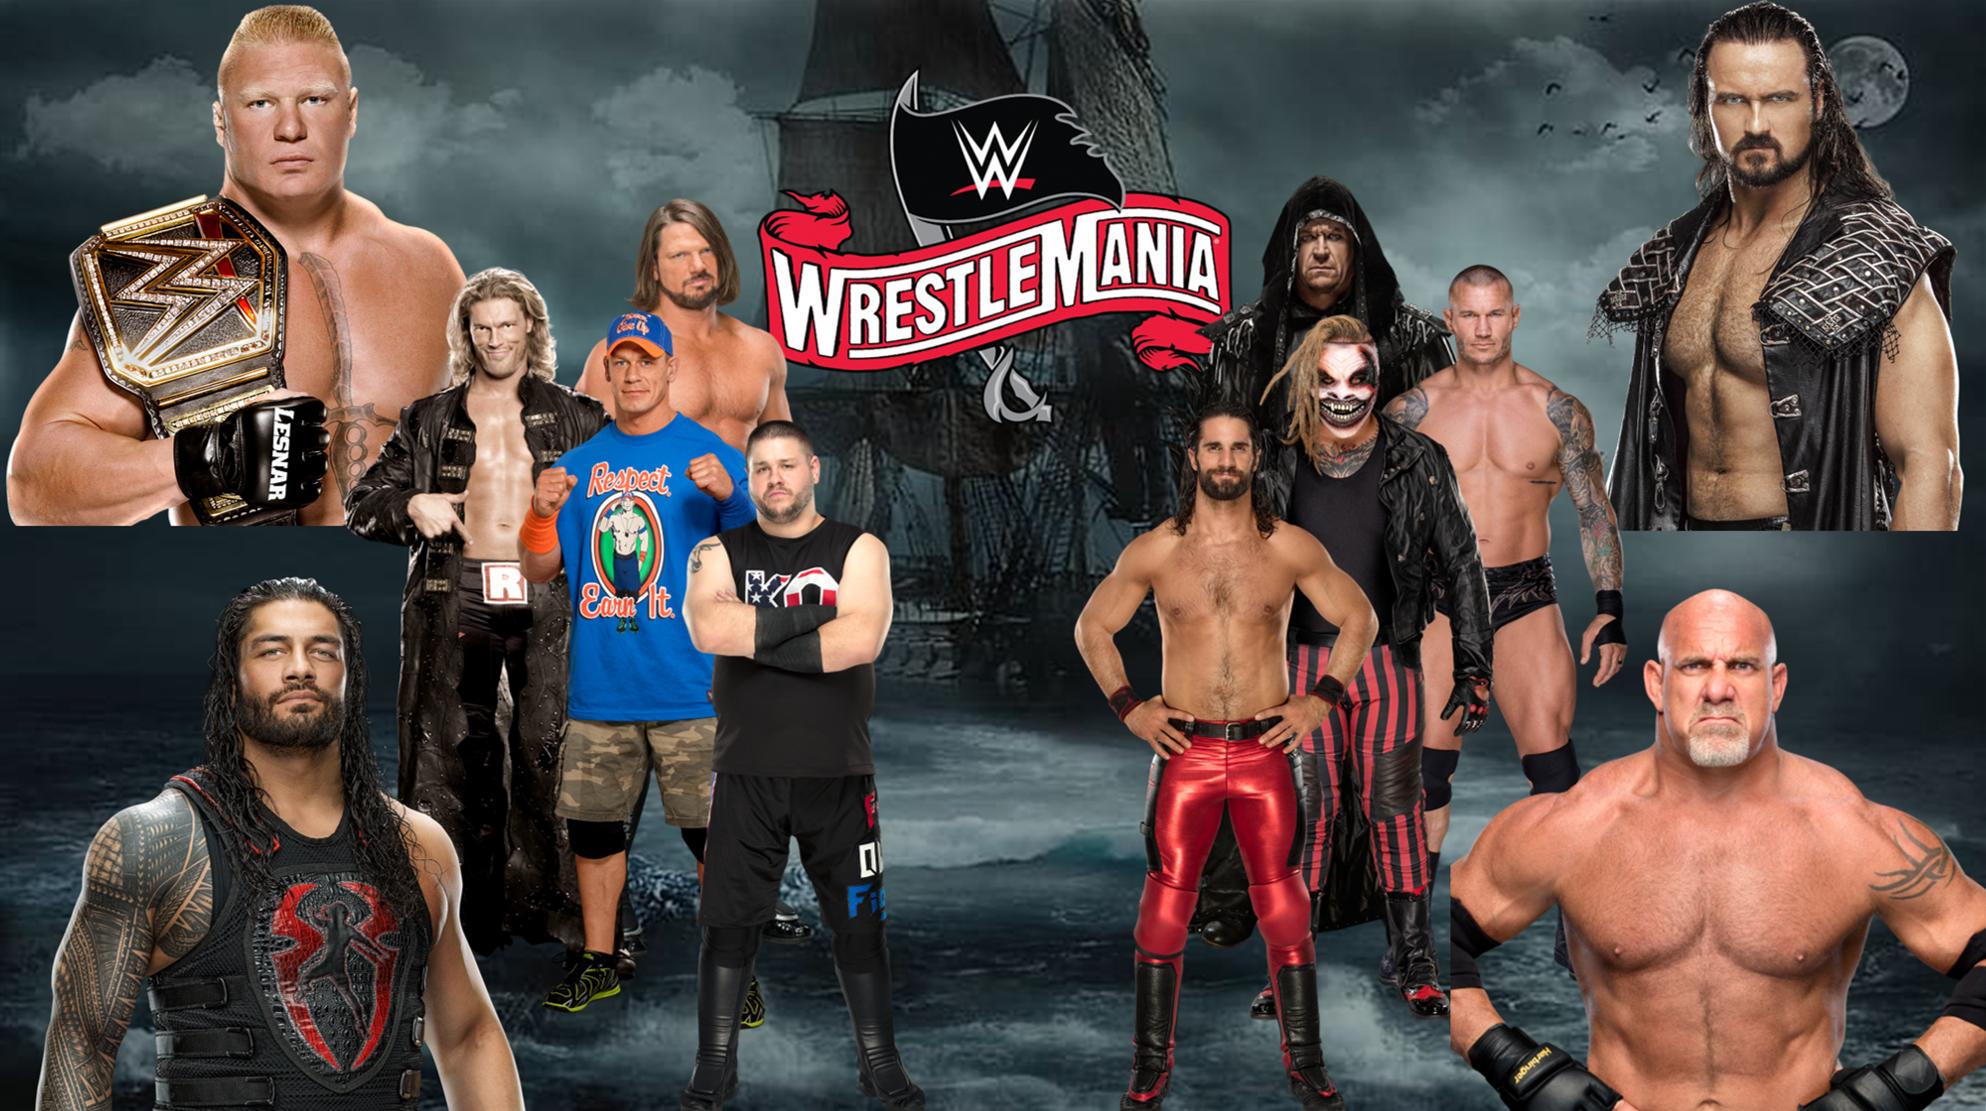 Wrestlemania 36 Kevin Owens Wrestlemania John Cena